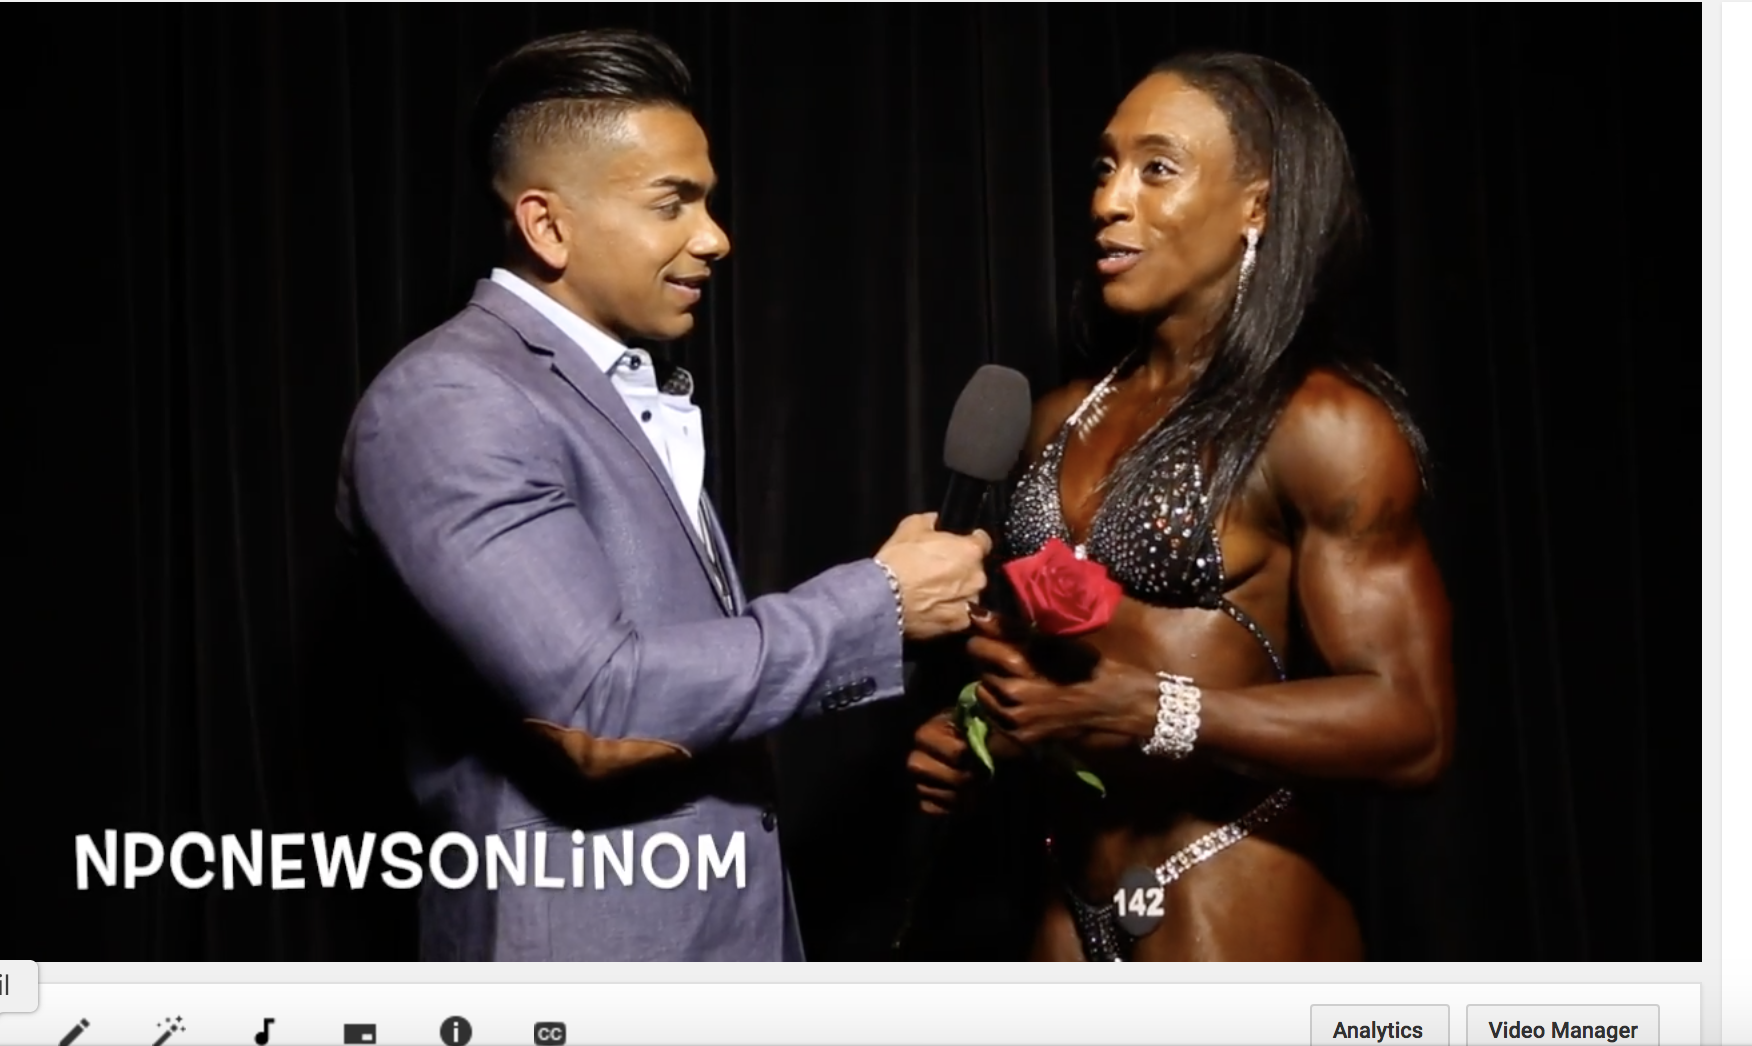 2017 NPC USA Women's Physique Overall Winner Courtney Rheams Interviewed By IFBB Pro Freddy Mac